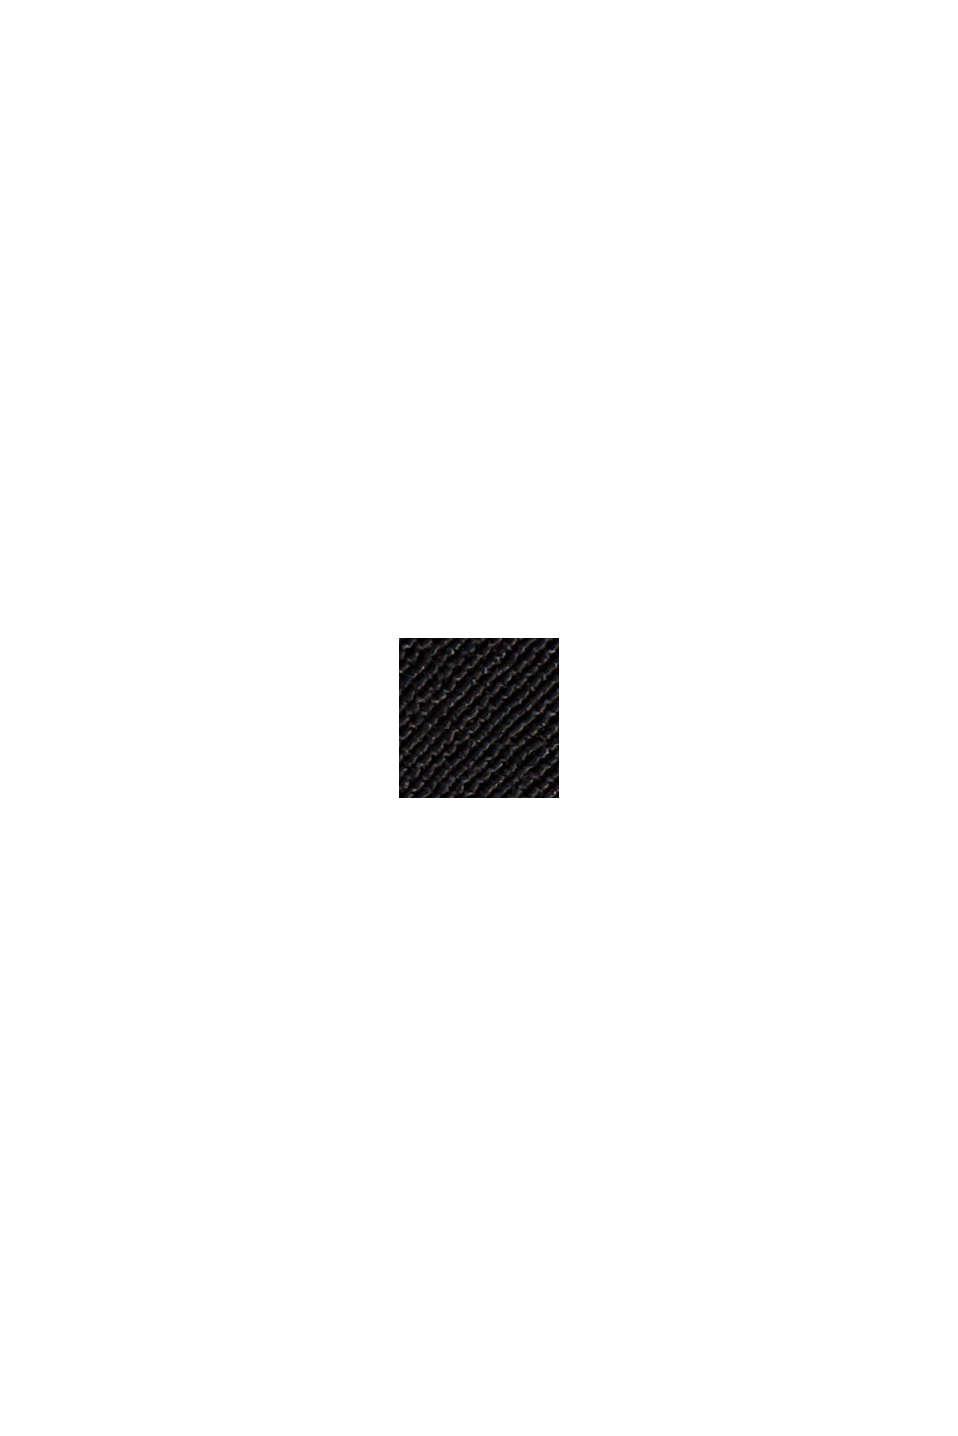 Robe longueur midi à dentelle, LENZING™ ECOVERO™, BLACK, swatch